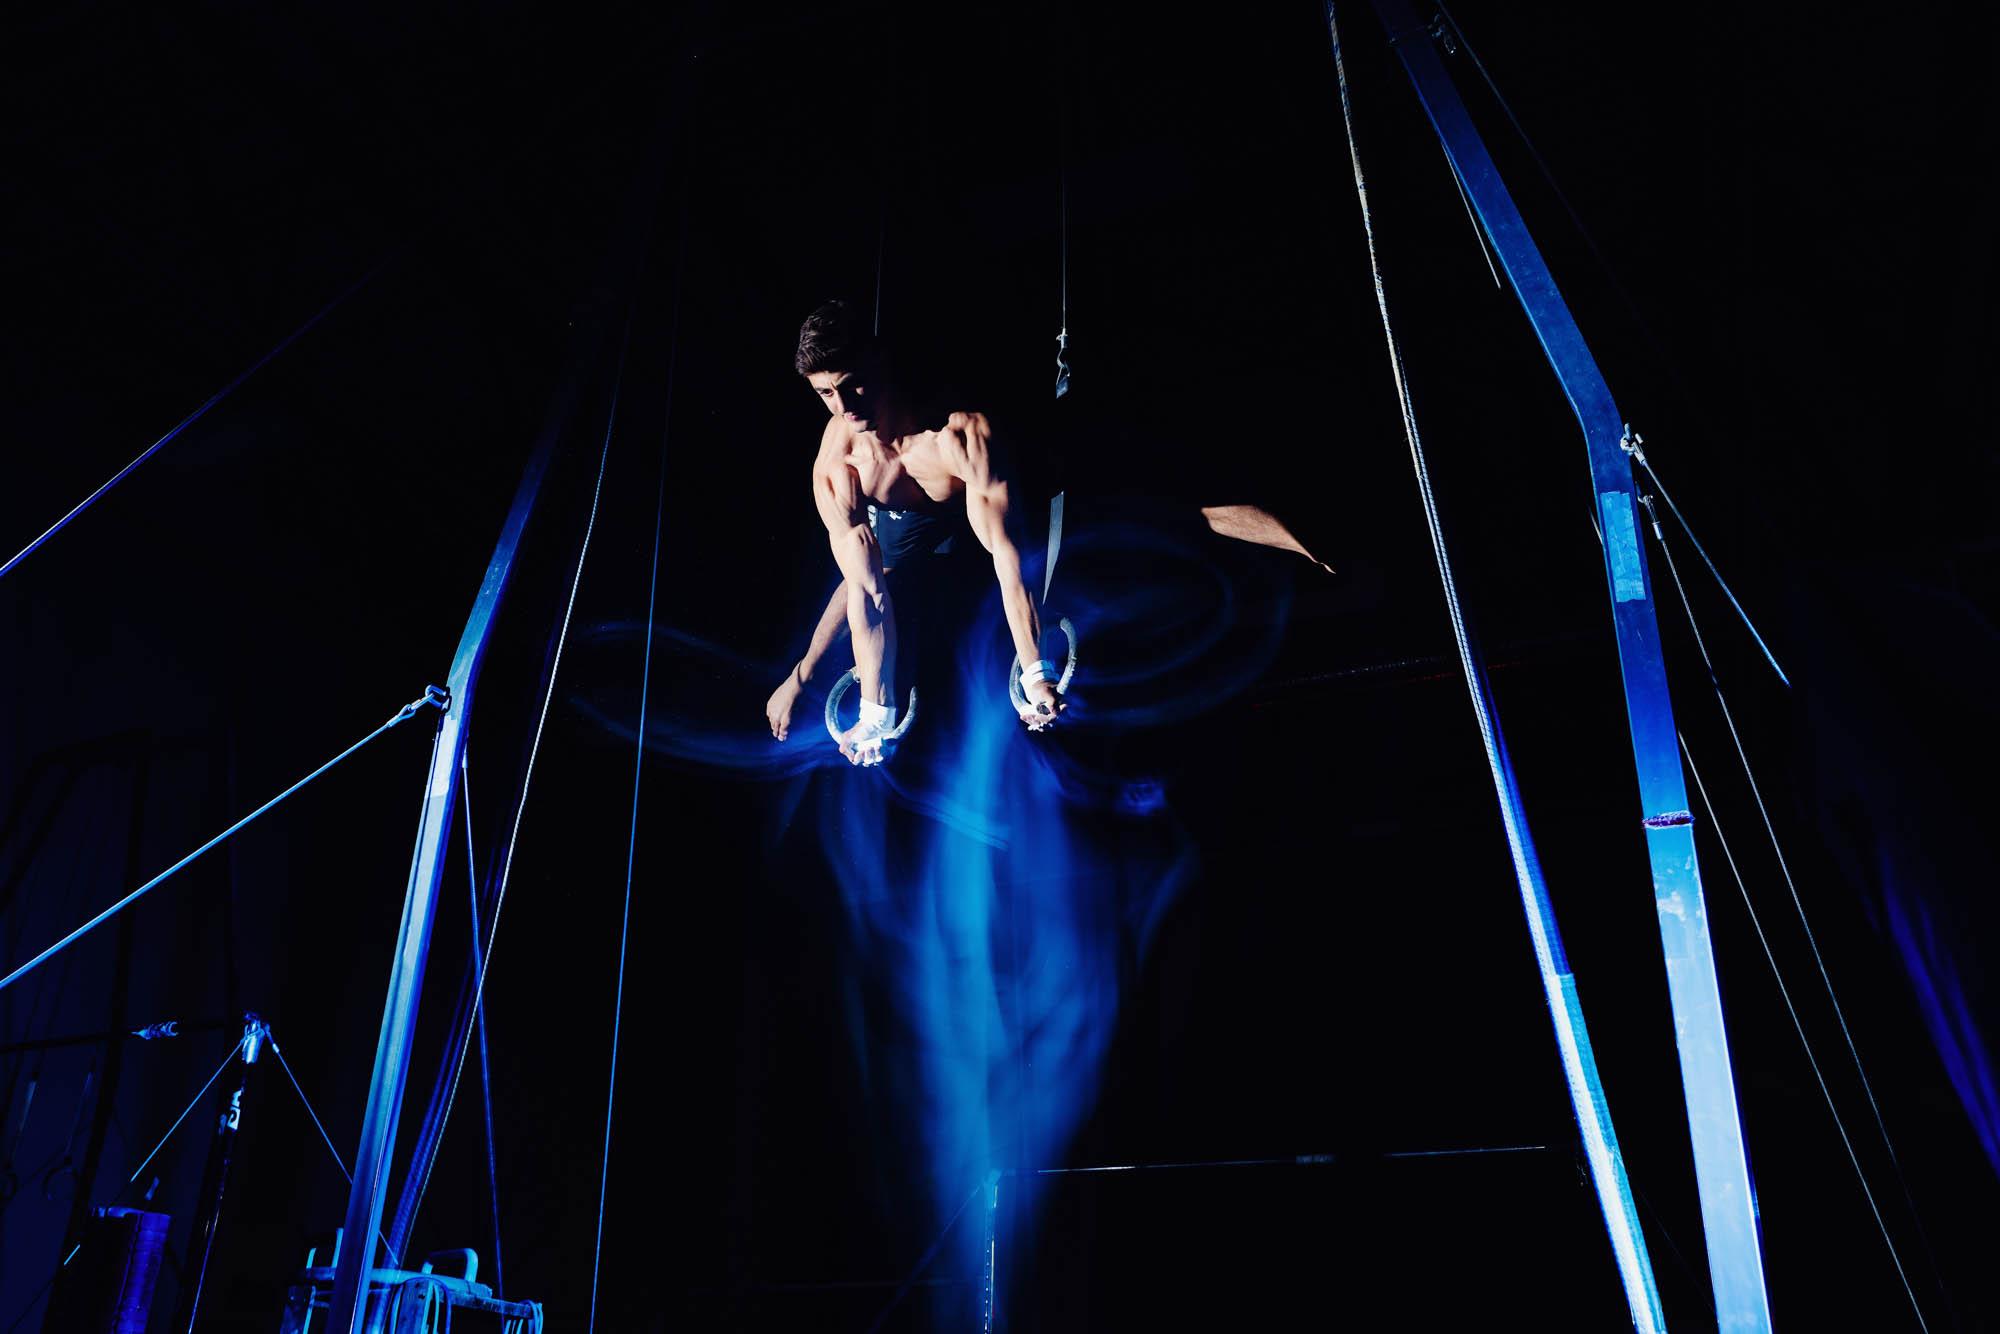 Lex & Josh Devy & Michelle Editorial Shoot Gymnastics Dance Light Trail Athlete-8.jpg